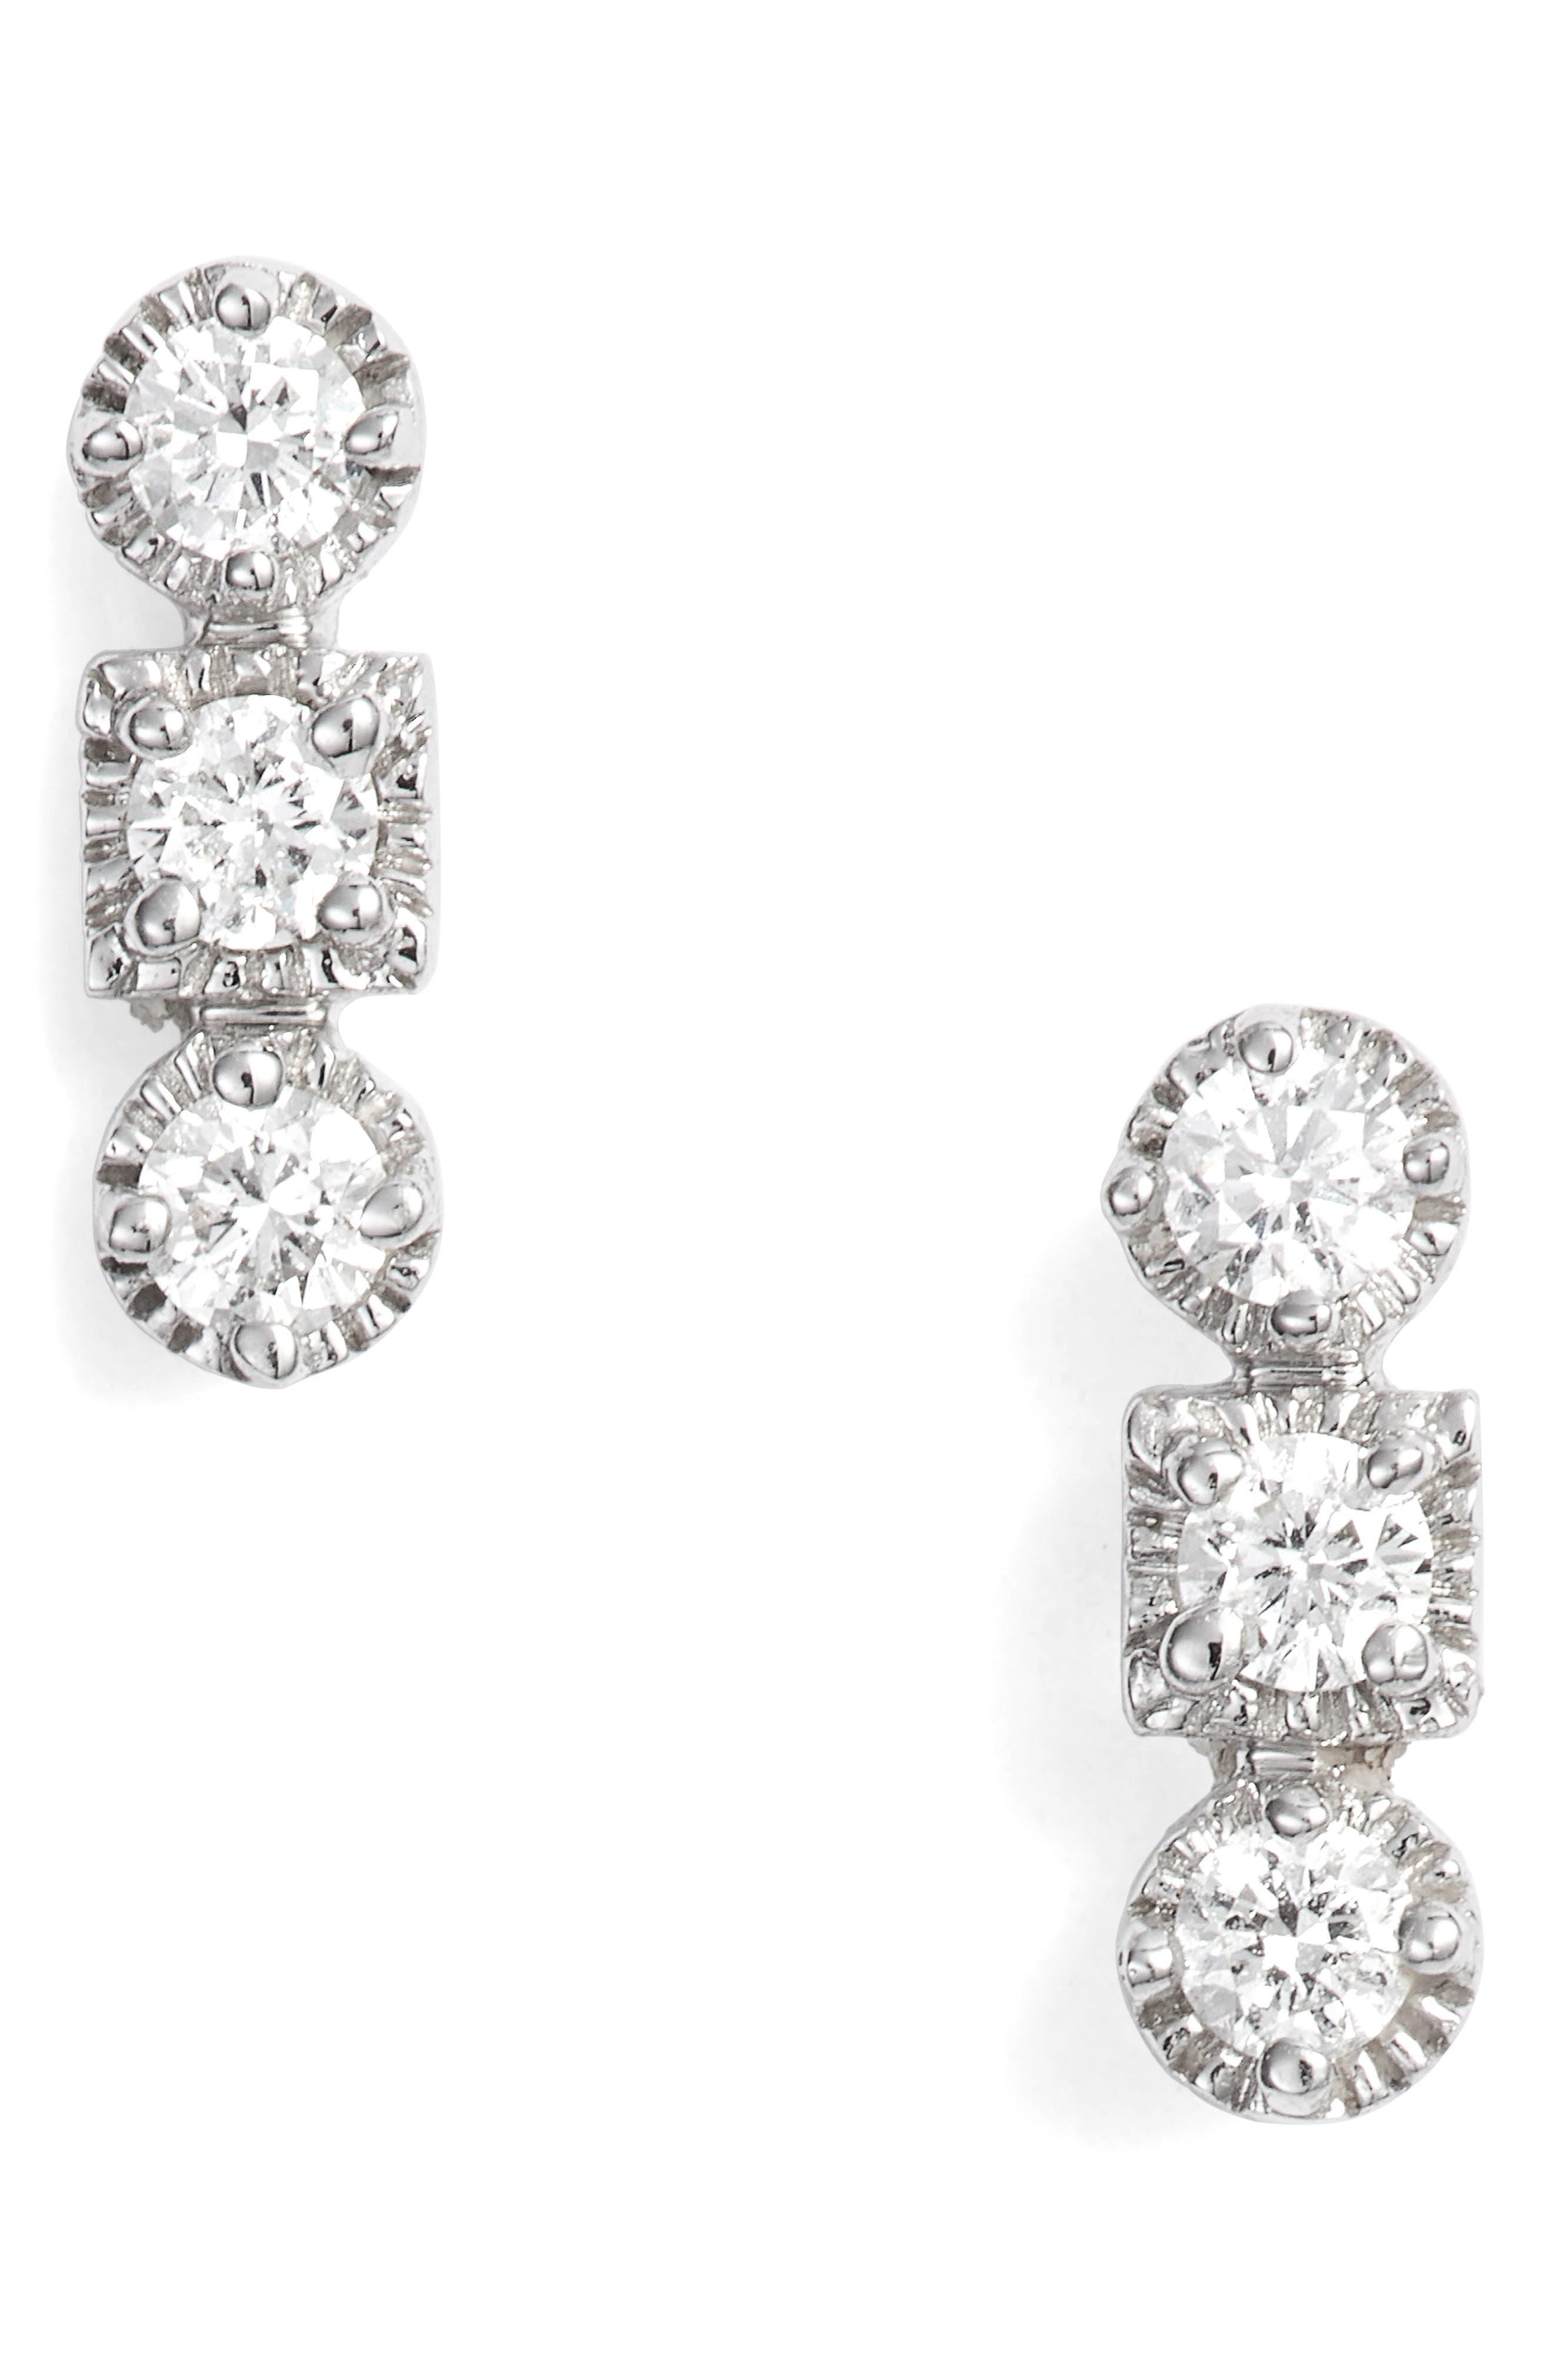 Maya 3-Stone Stud Earrings,                             Main thumbnail 1, color,                             WHITE GOLD/ DIAMOND